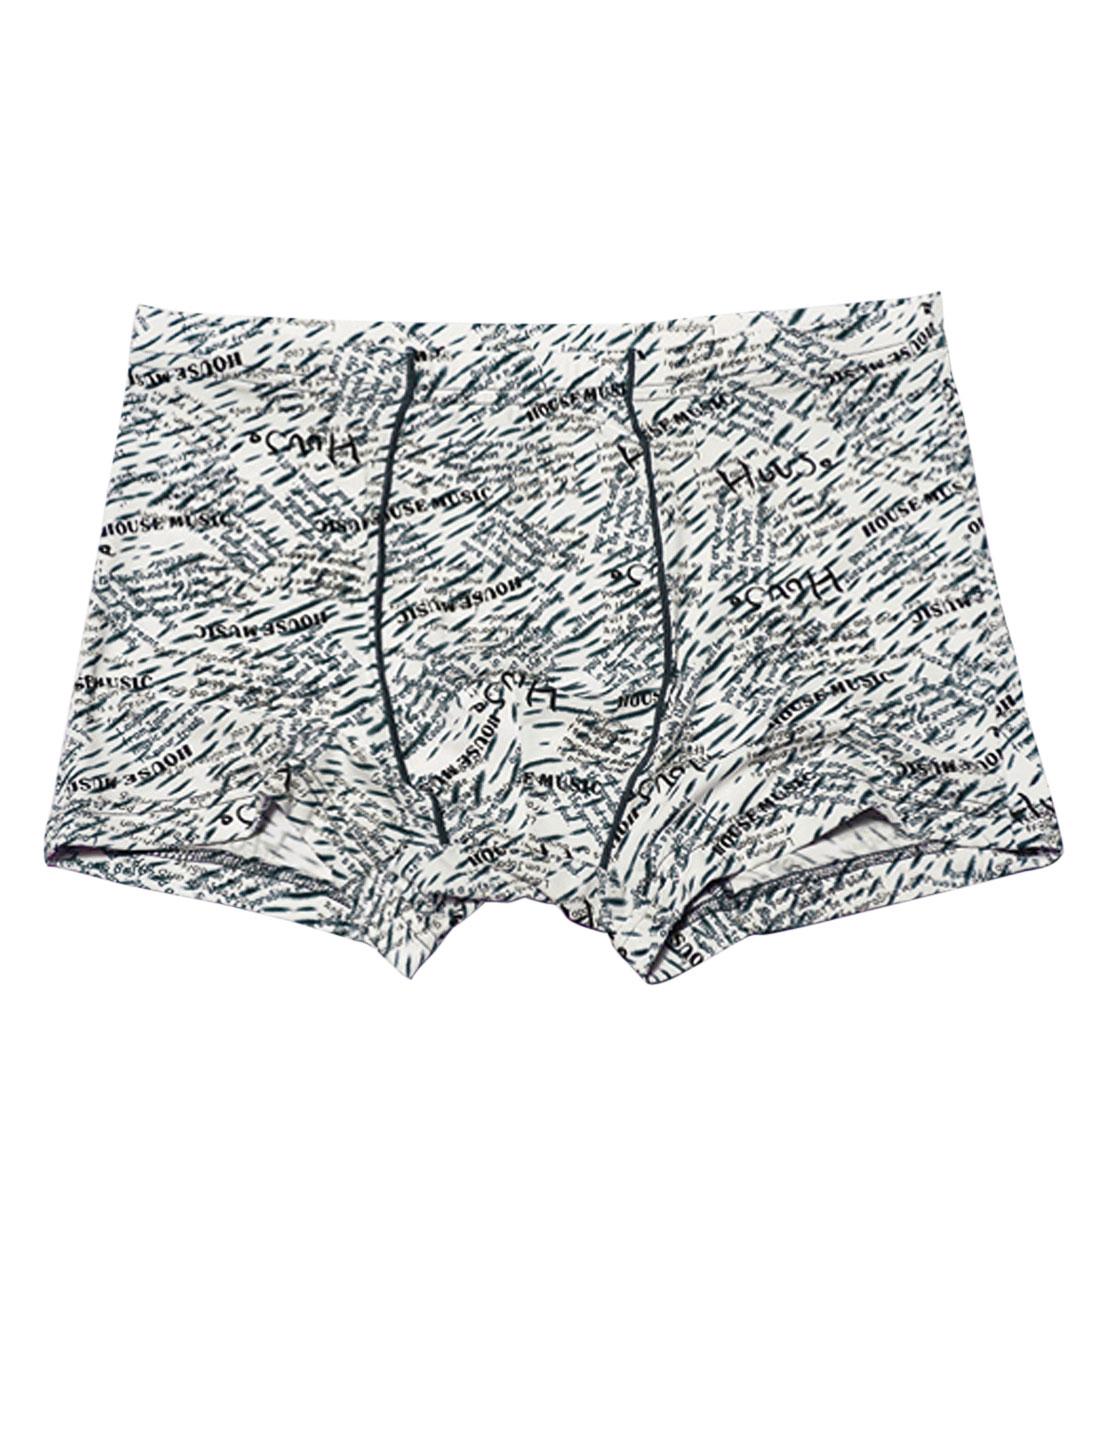 Men Elastic Waist Novelty Letters Print Soft Boxer Briefs Gray W30